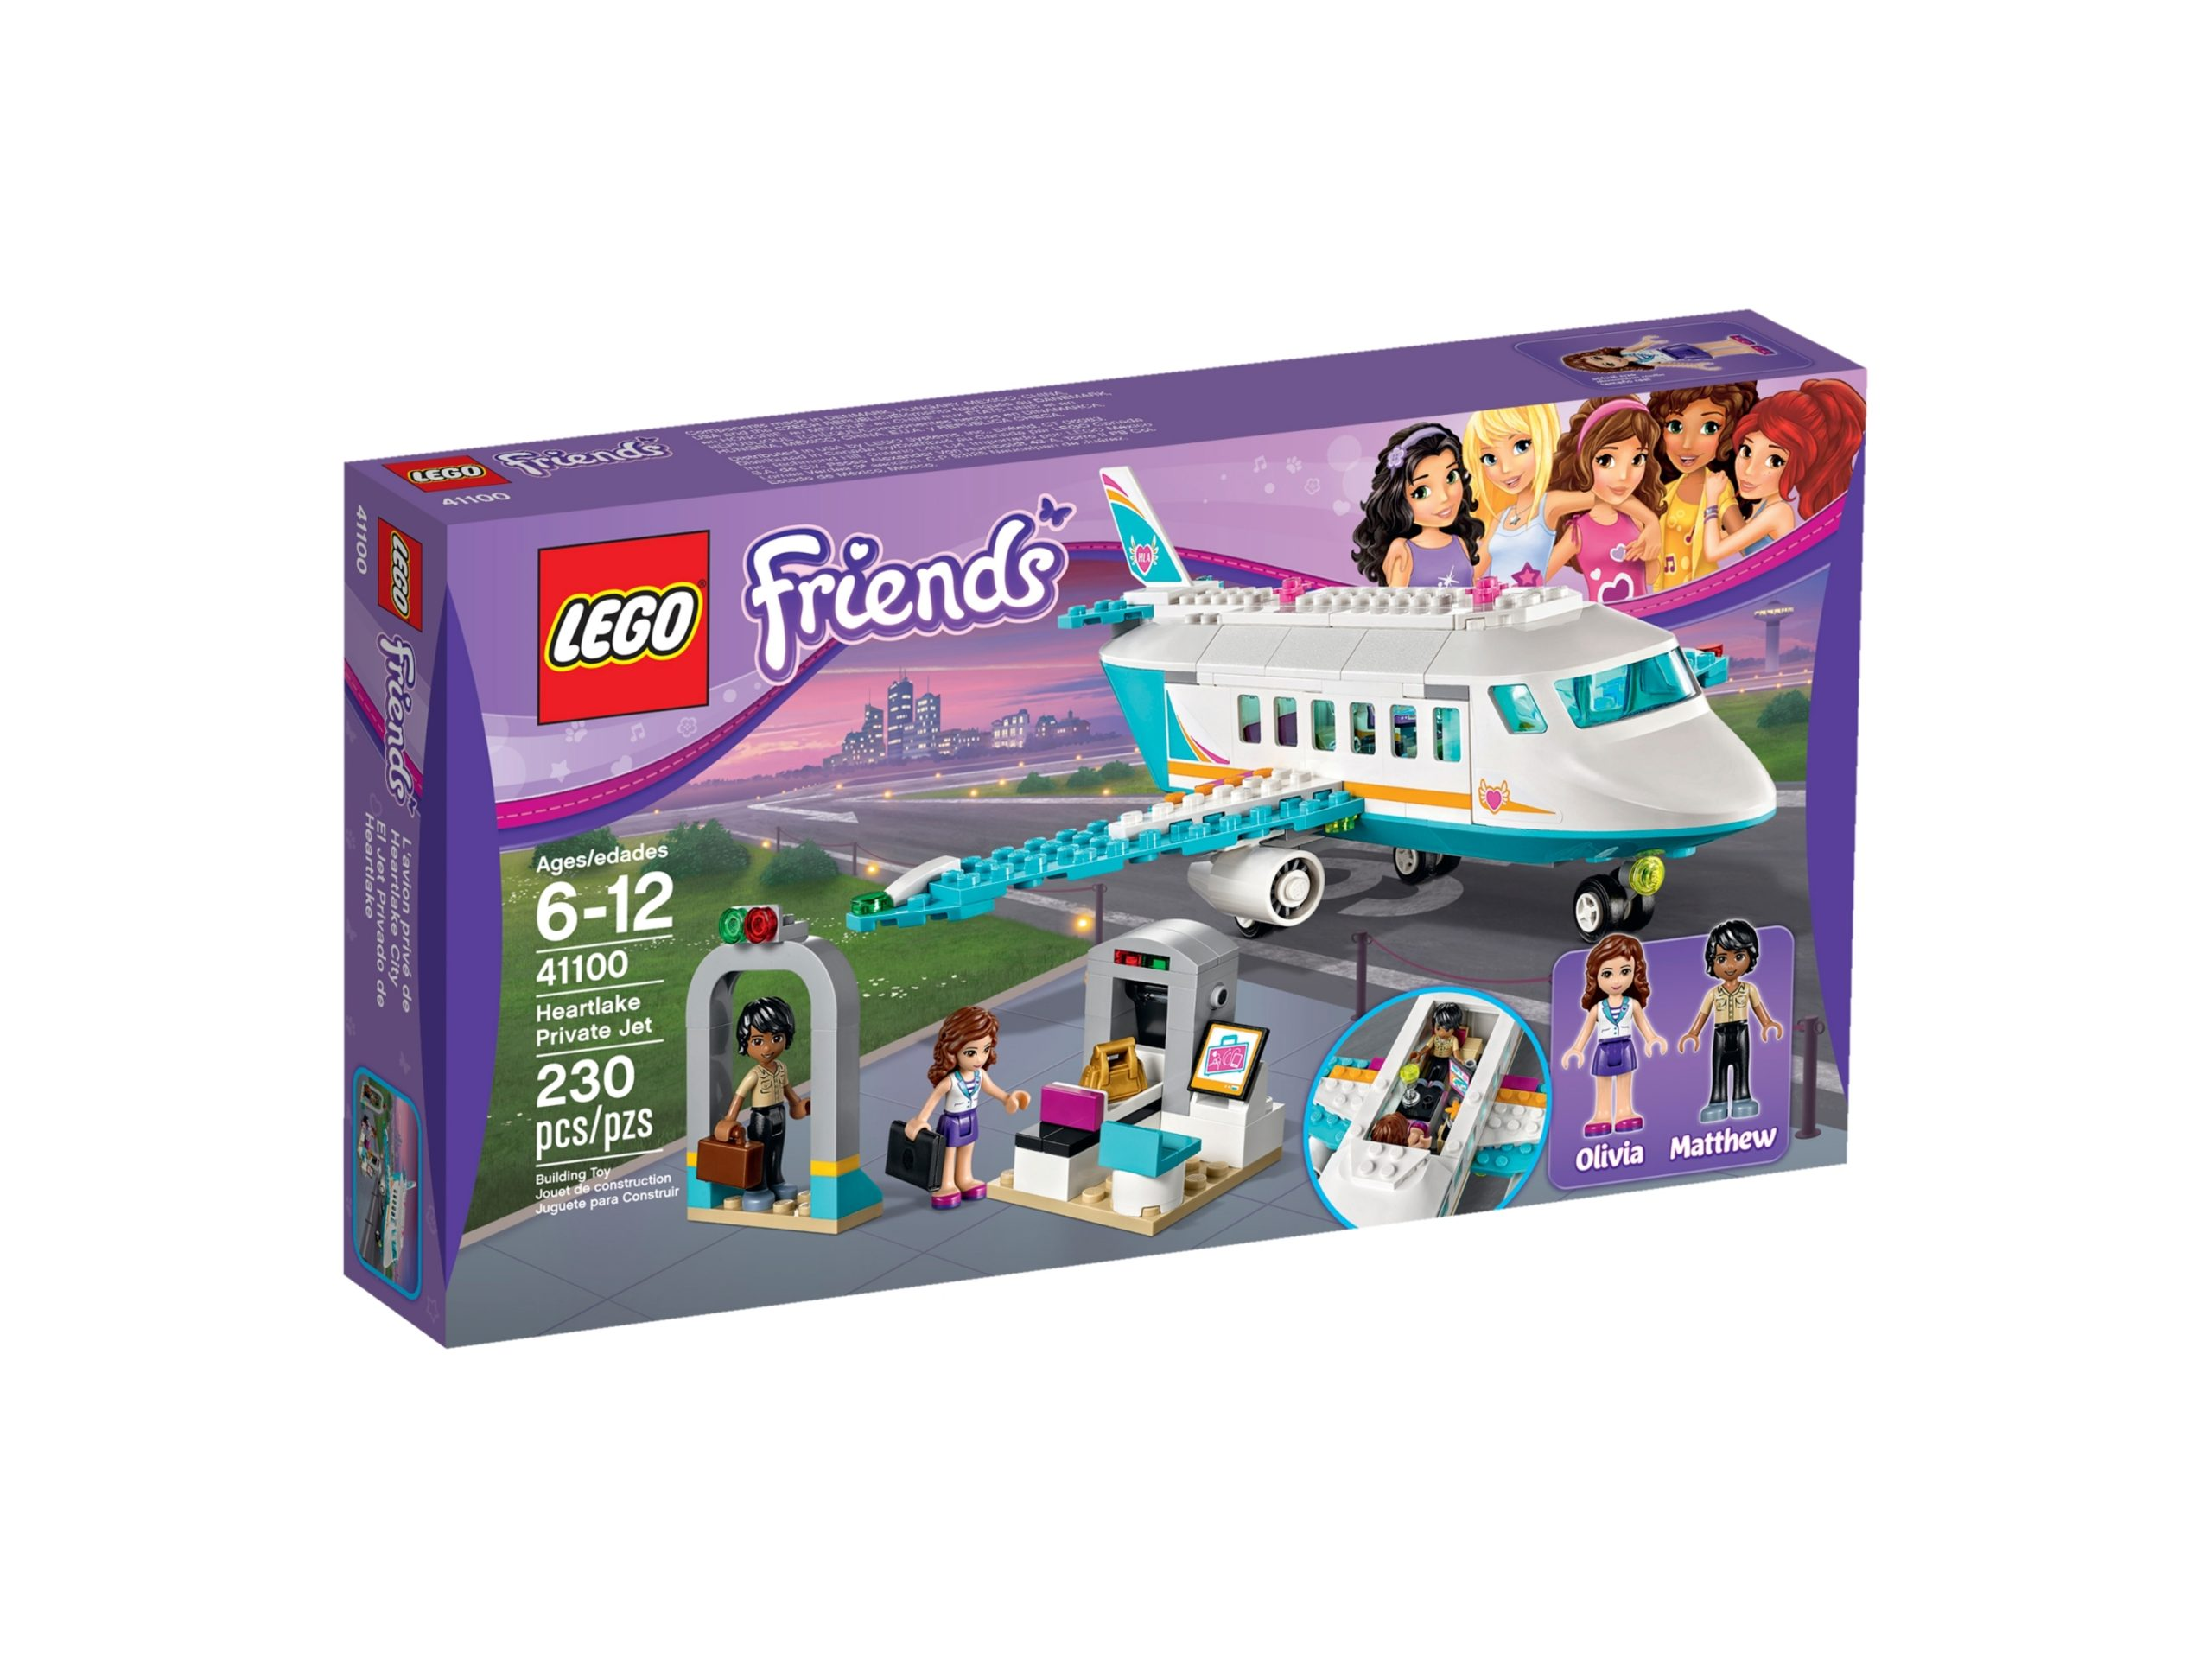 lego 41100 heartlake jet scaled